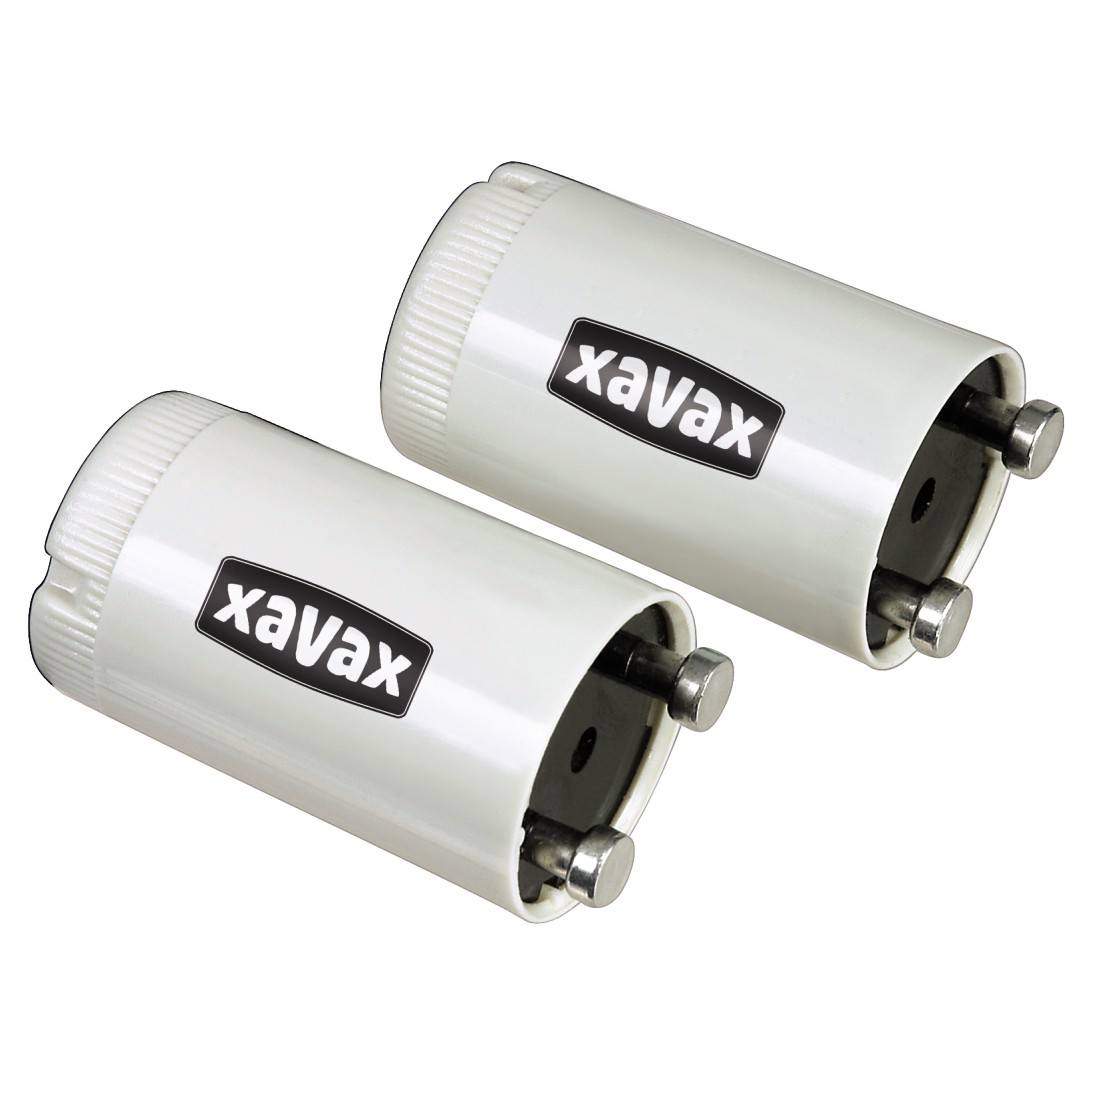 Xavax Eu 00110456 Xavax Quot St 65 Single Quot Fluorescent Bulb